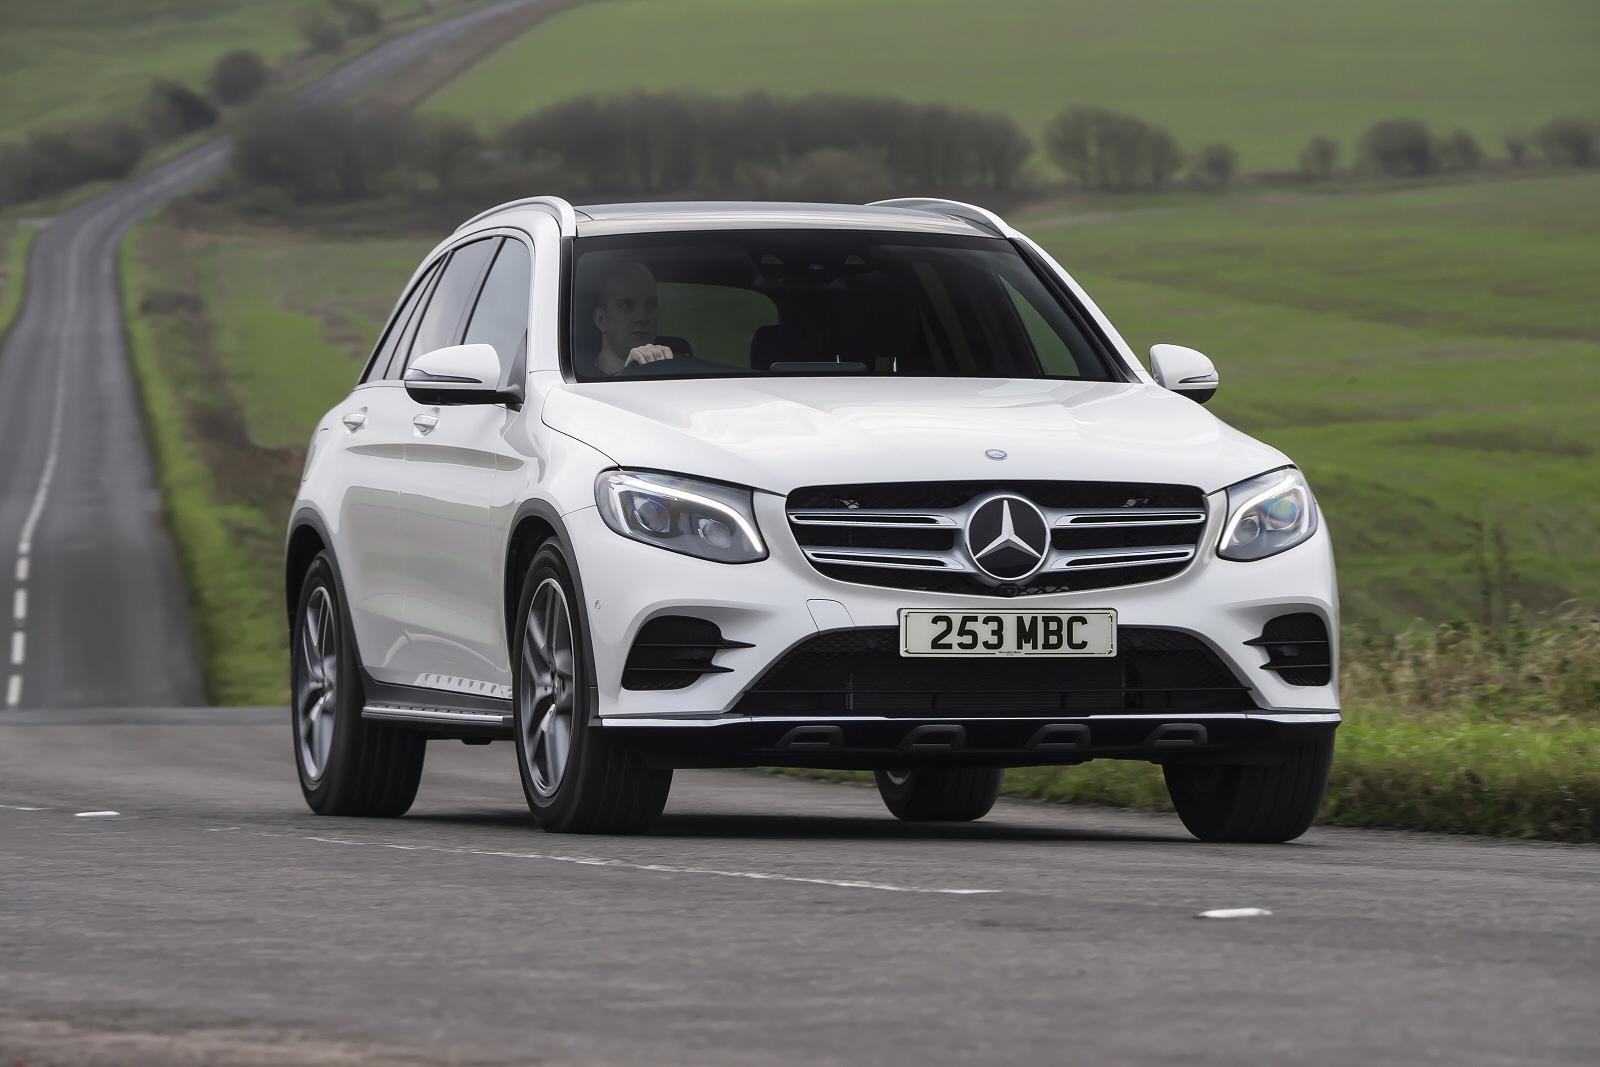 New Mercedes Benz Glc Glc 250 4matic Sport 5dr 9g Tronic Petrol